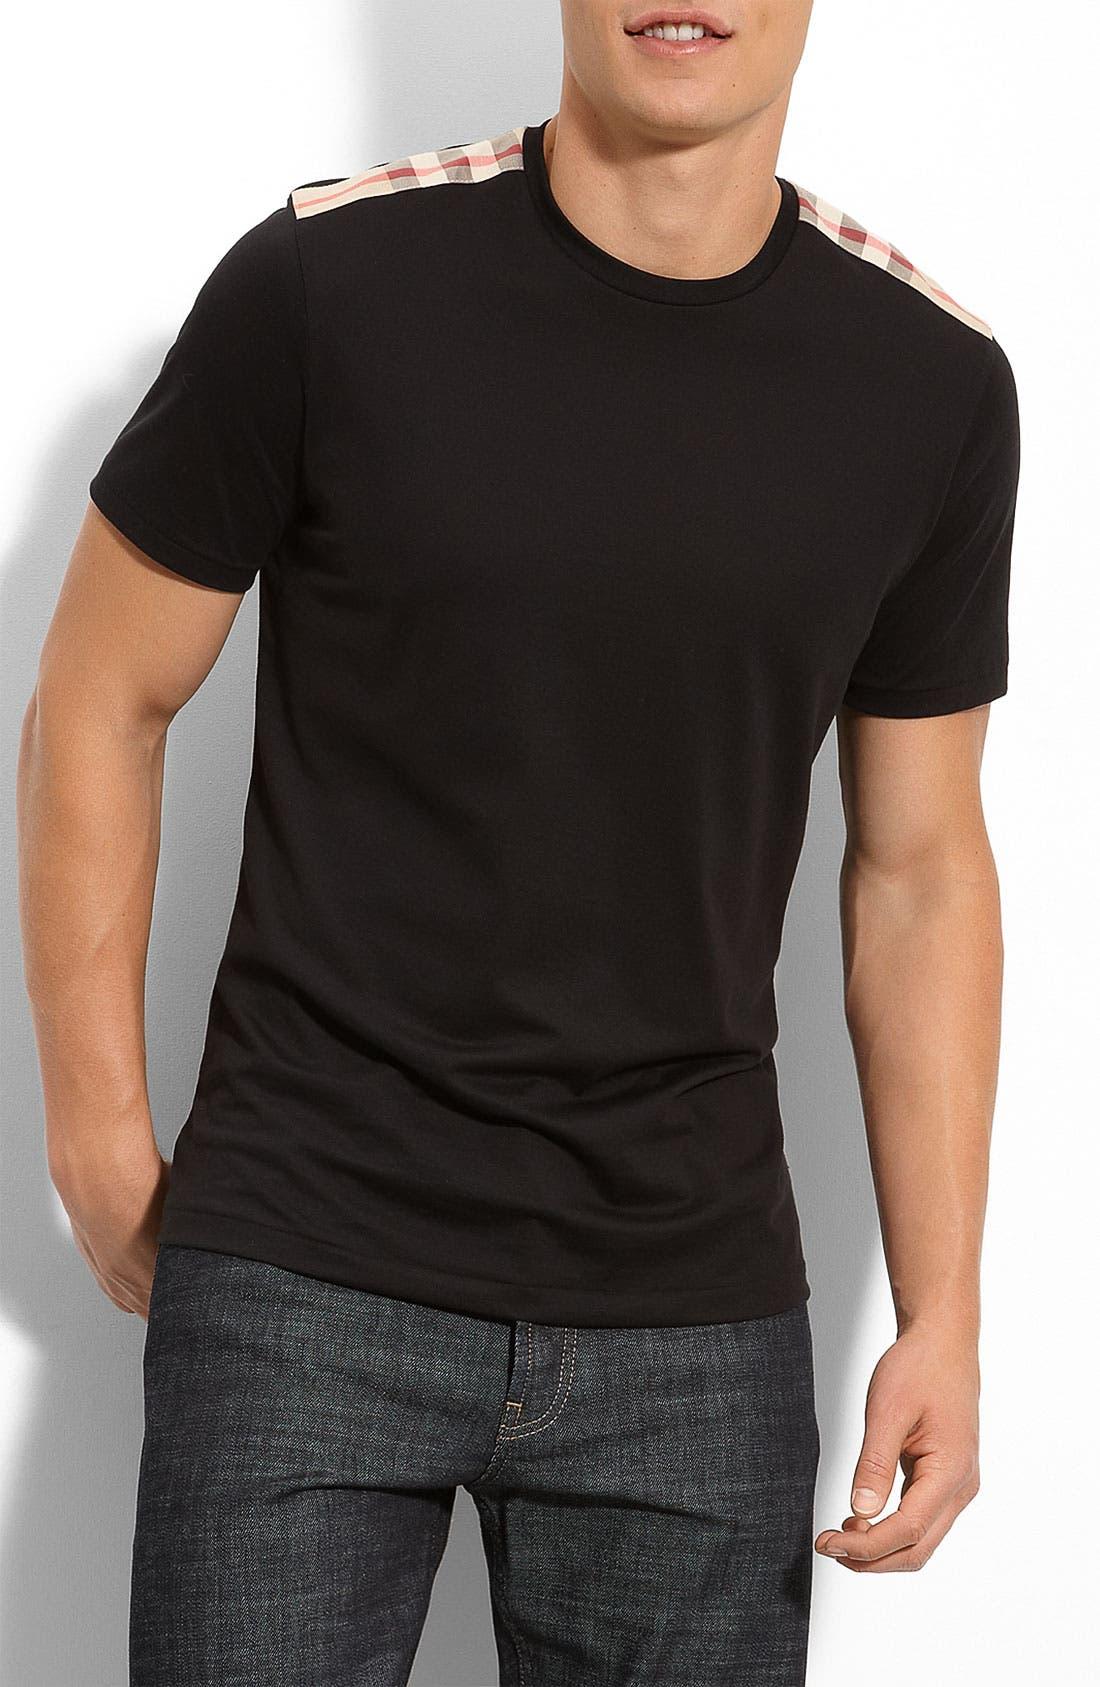 Main Image - Burberry Brit Check Trim Fit T-Shirt